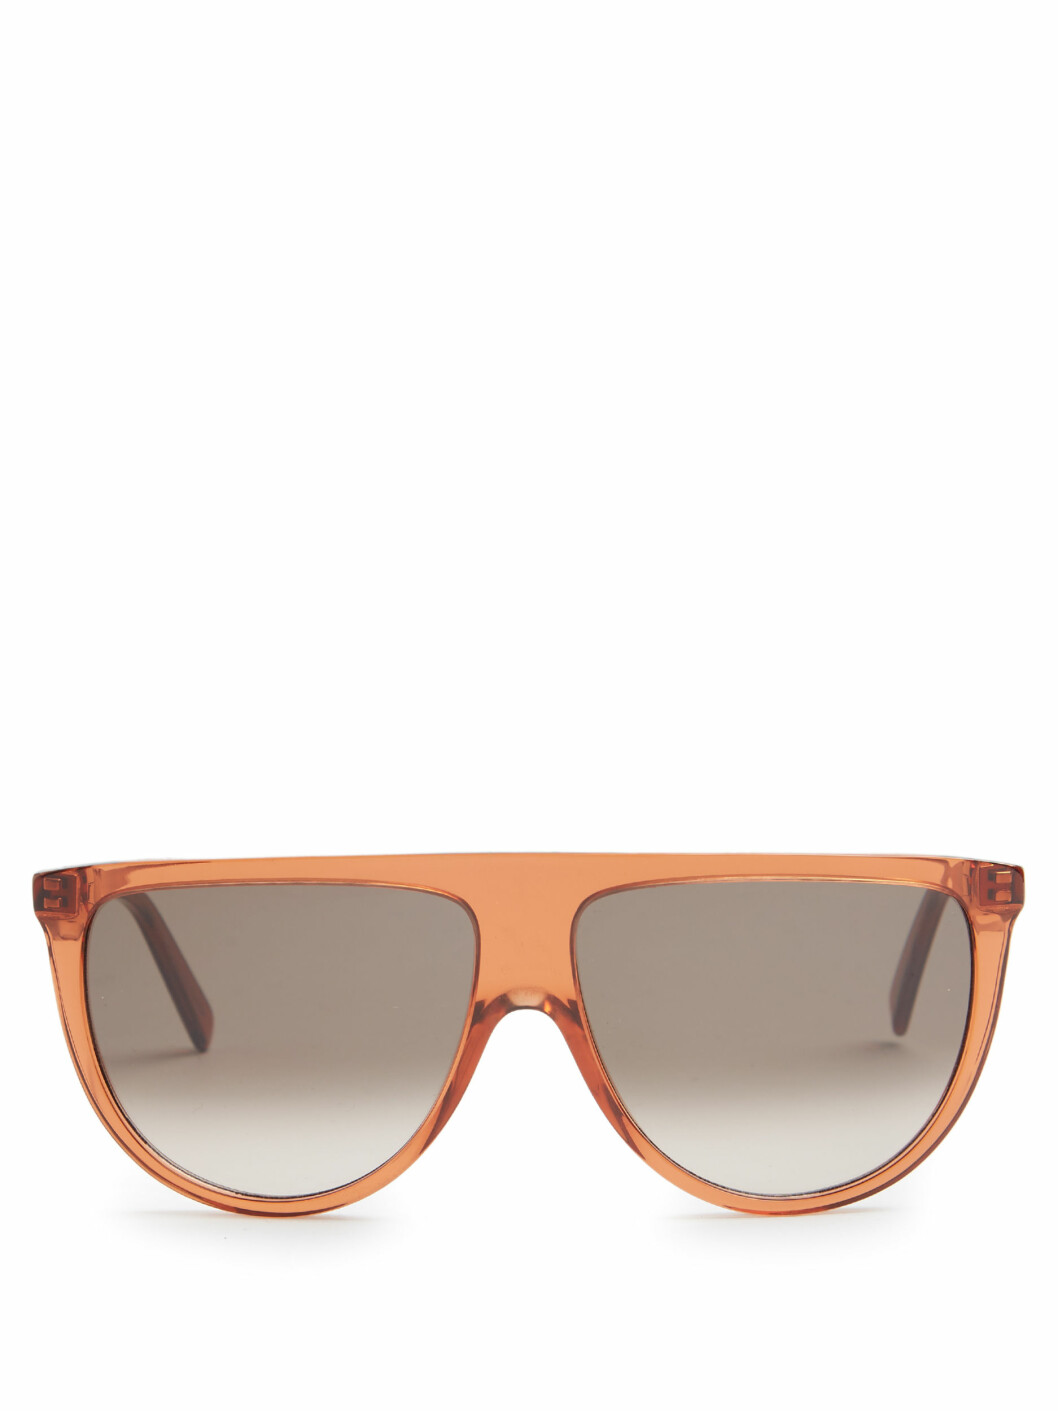 Solbriller fra Celine via Matchesfashion.com | kr 1905 | http://www.matchesfashion.com/intl/products/C%C3%A9line-Eyewear-Shadow-flat-top-sunglasses-1077835